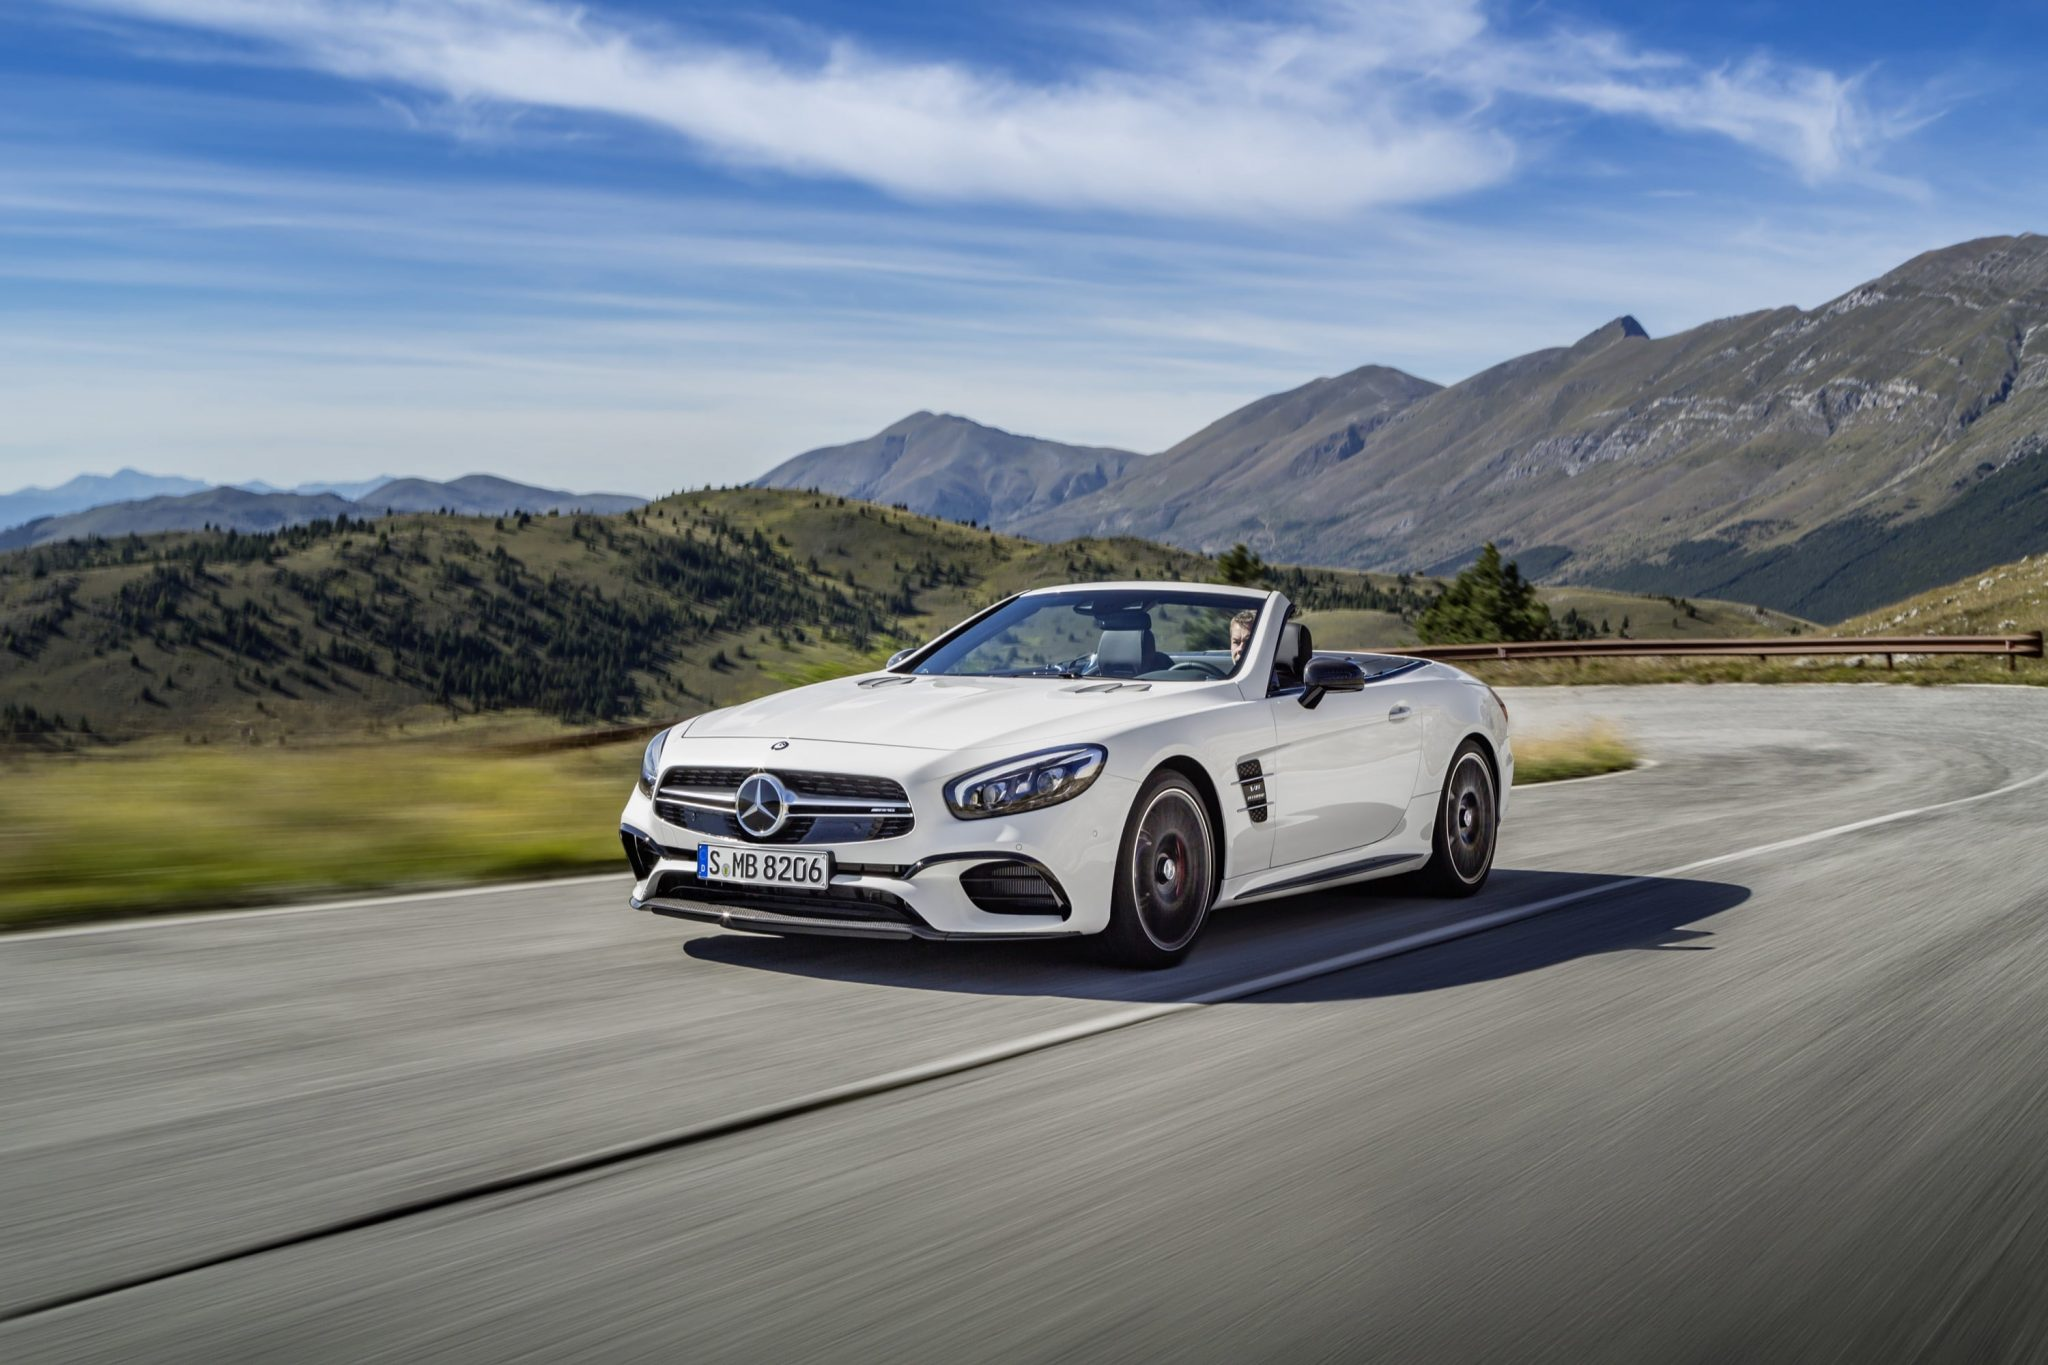 https://i0.wp.com/www.testmiles.com/wp-content/uploads/2016/10/2017-Mercedes-Benz-SL63-AMG-11.jpg